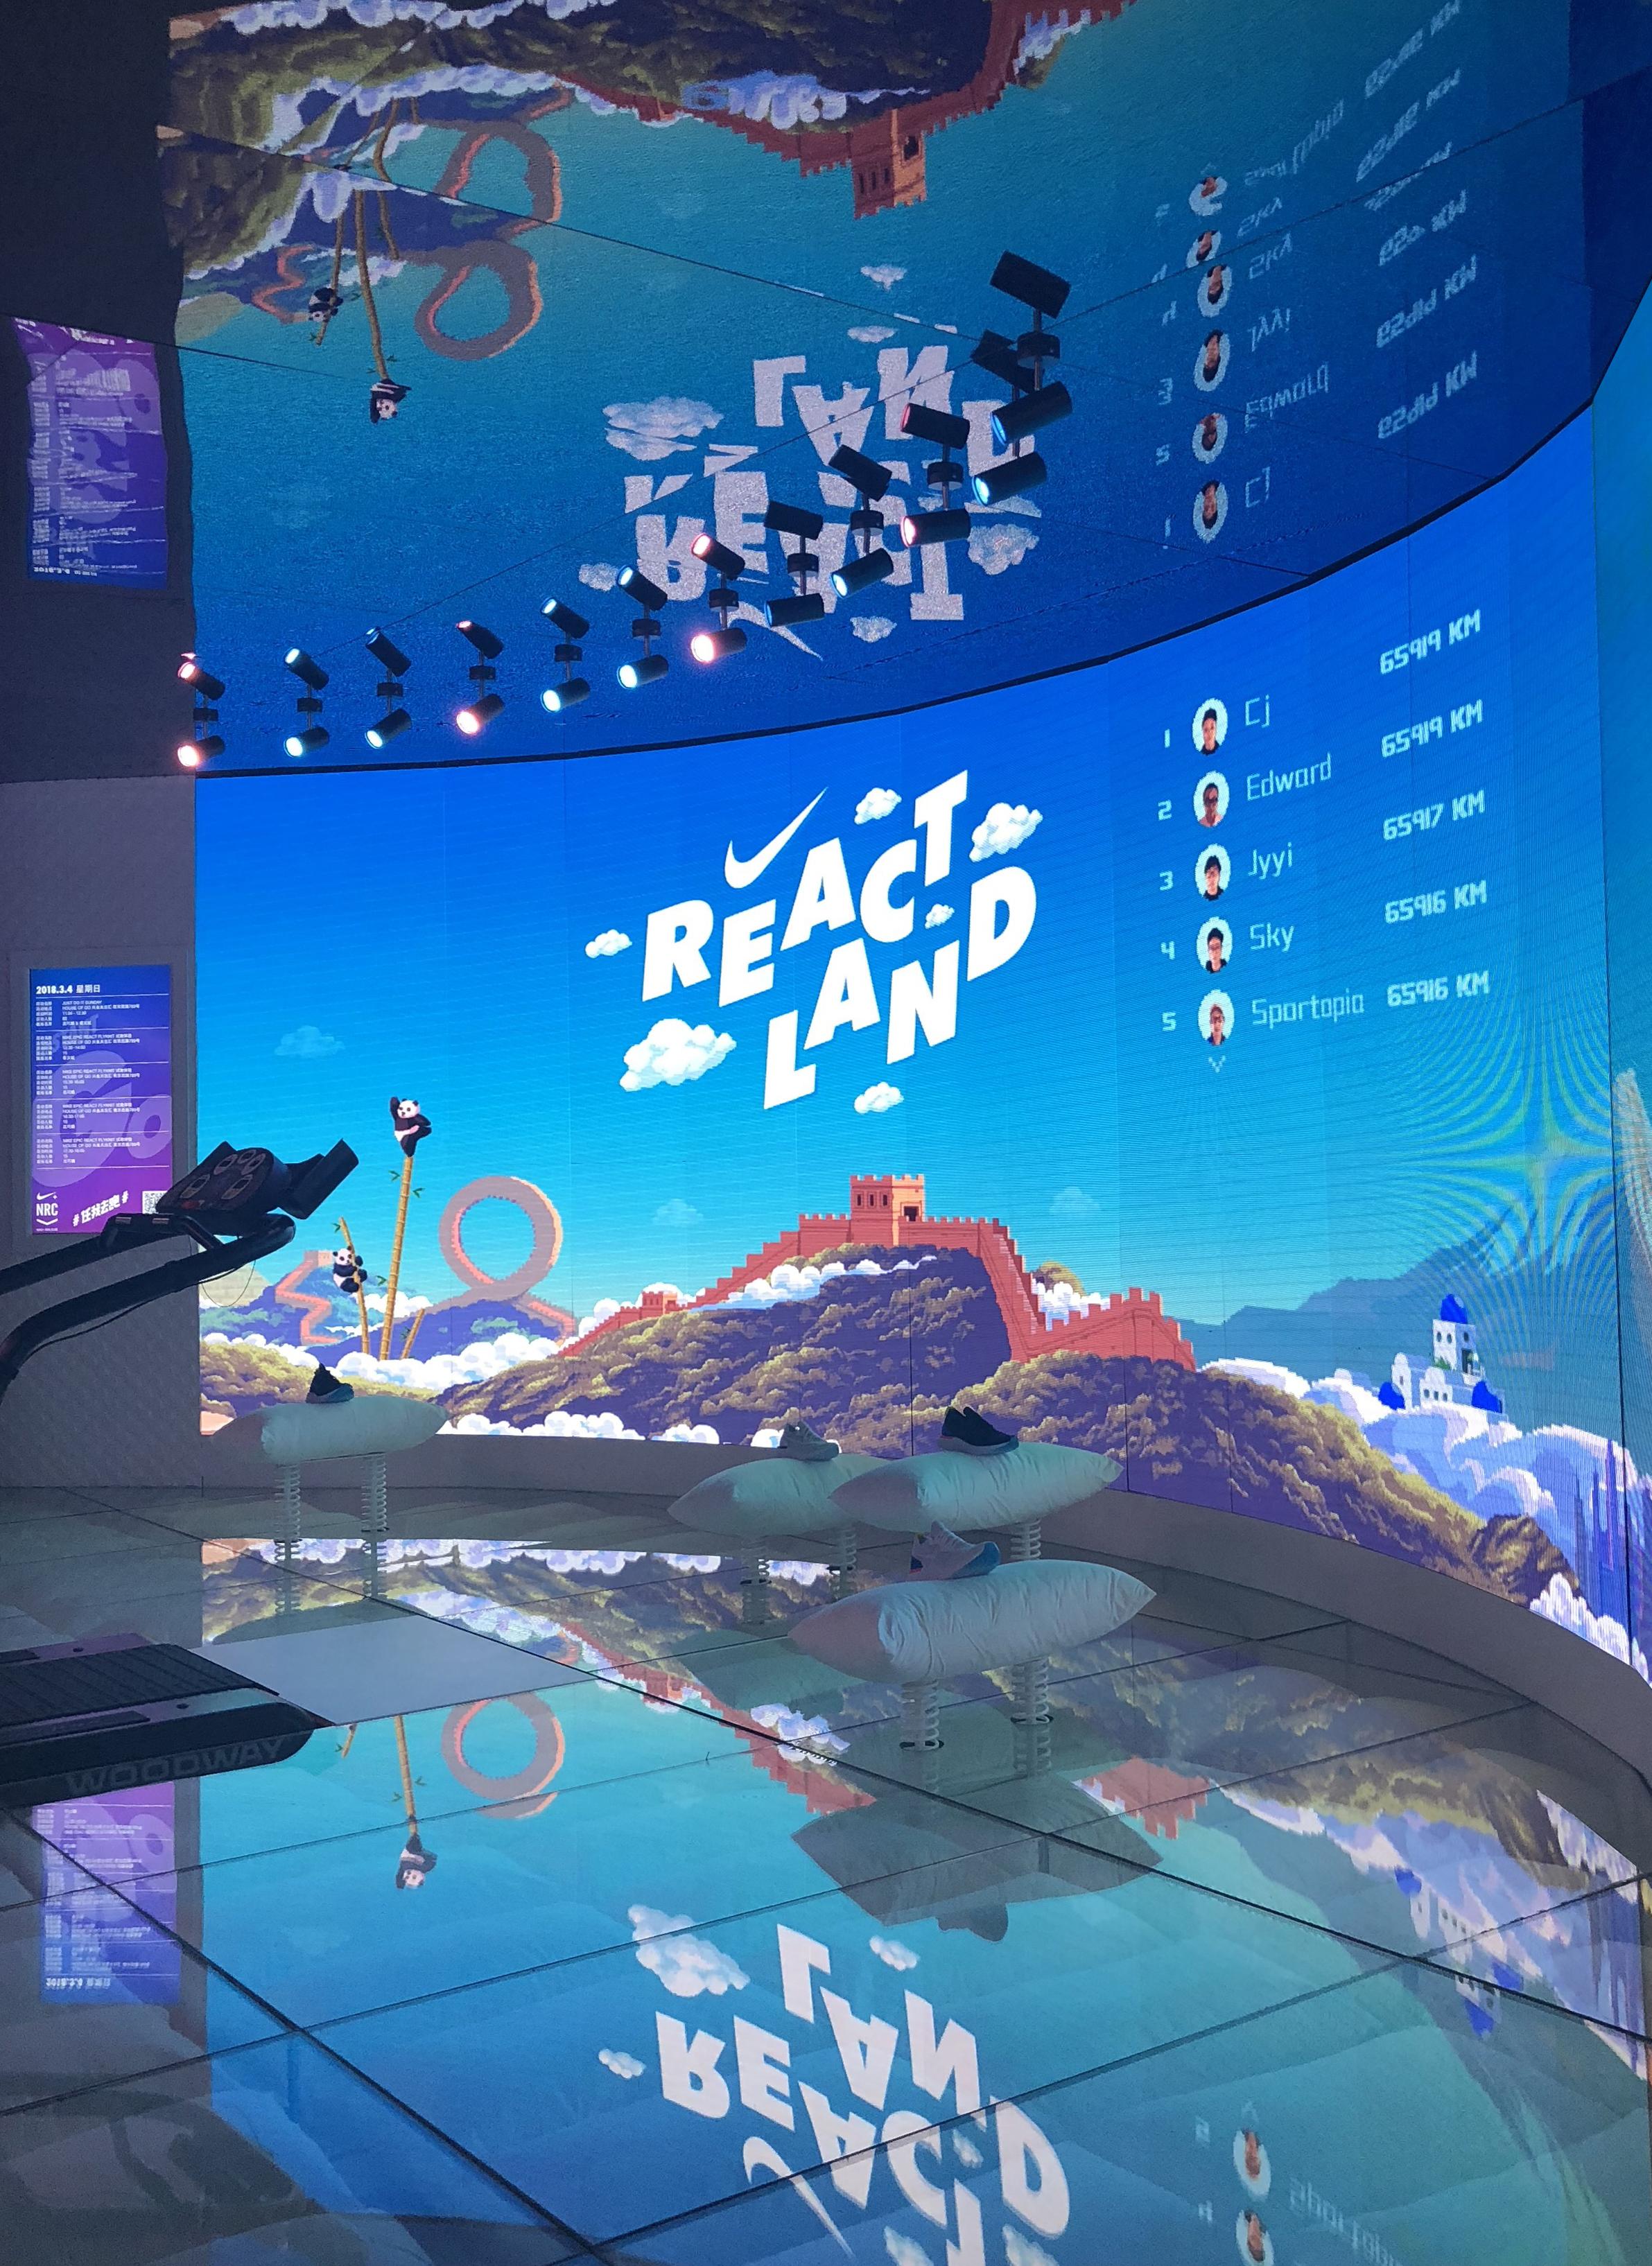 Nike Reactland